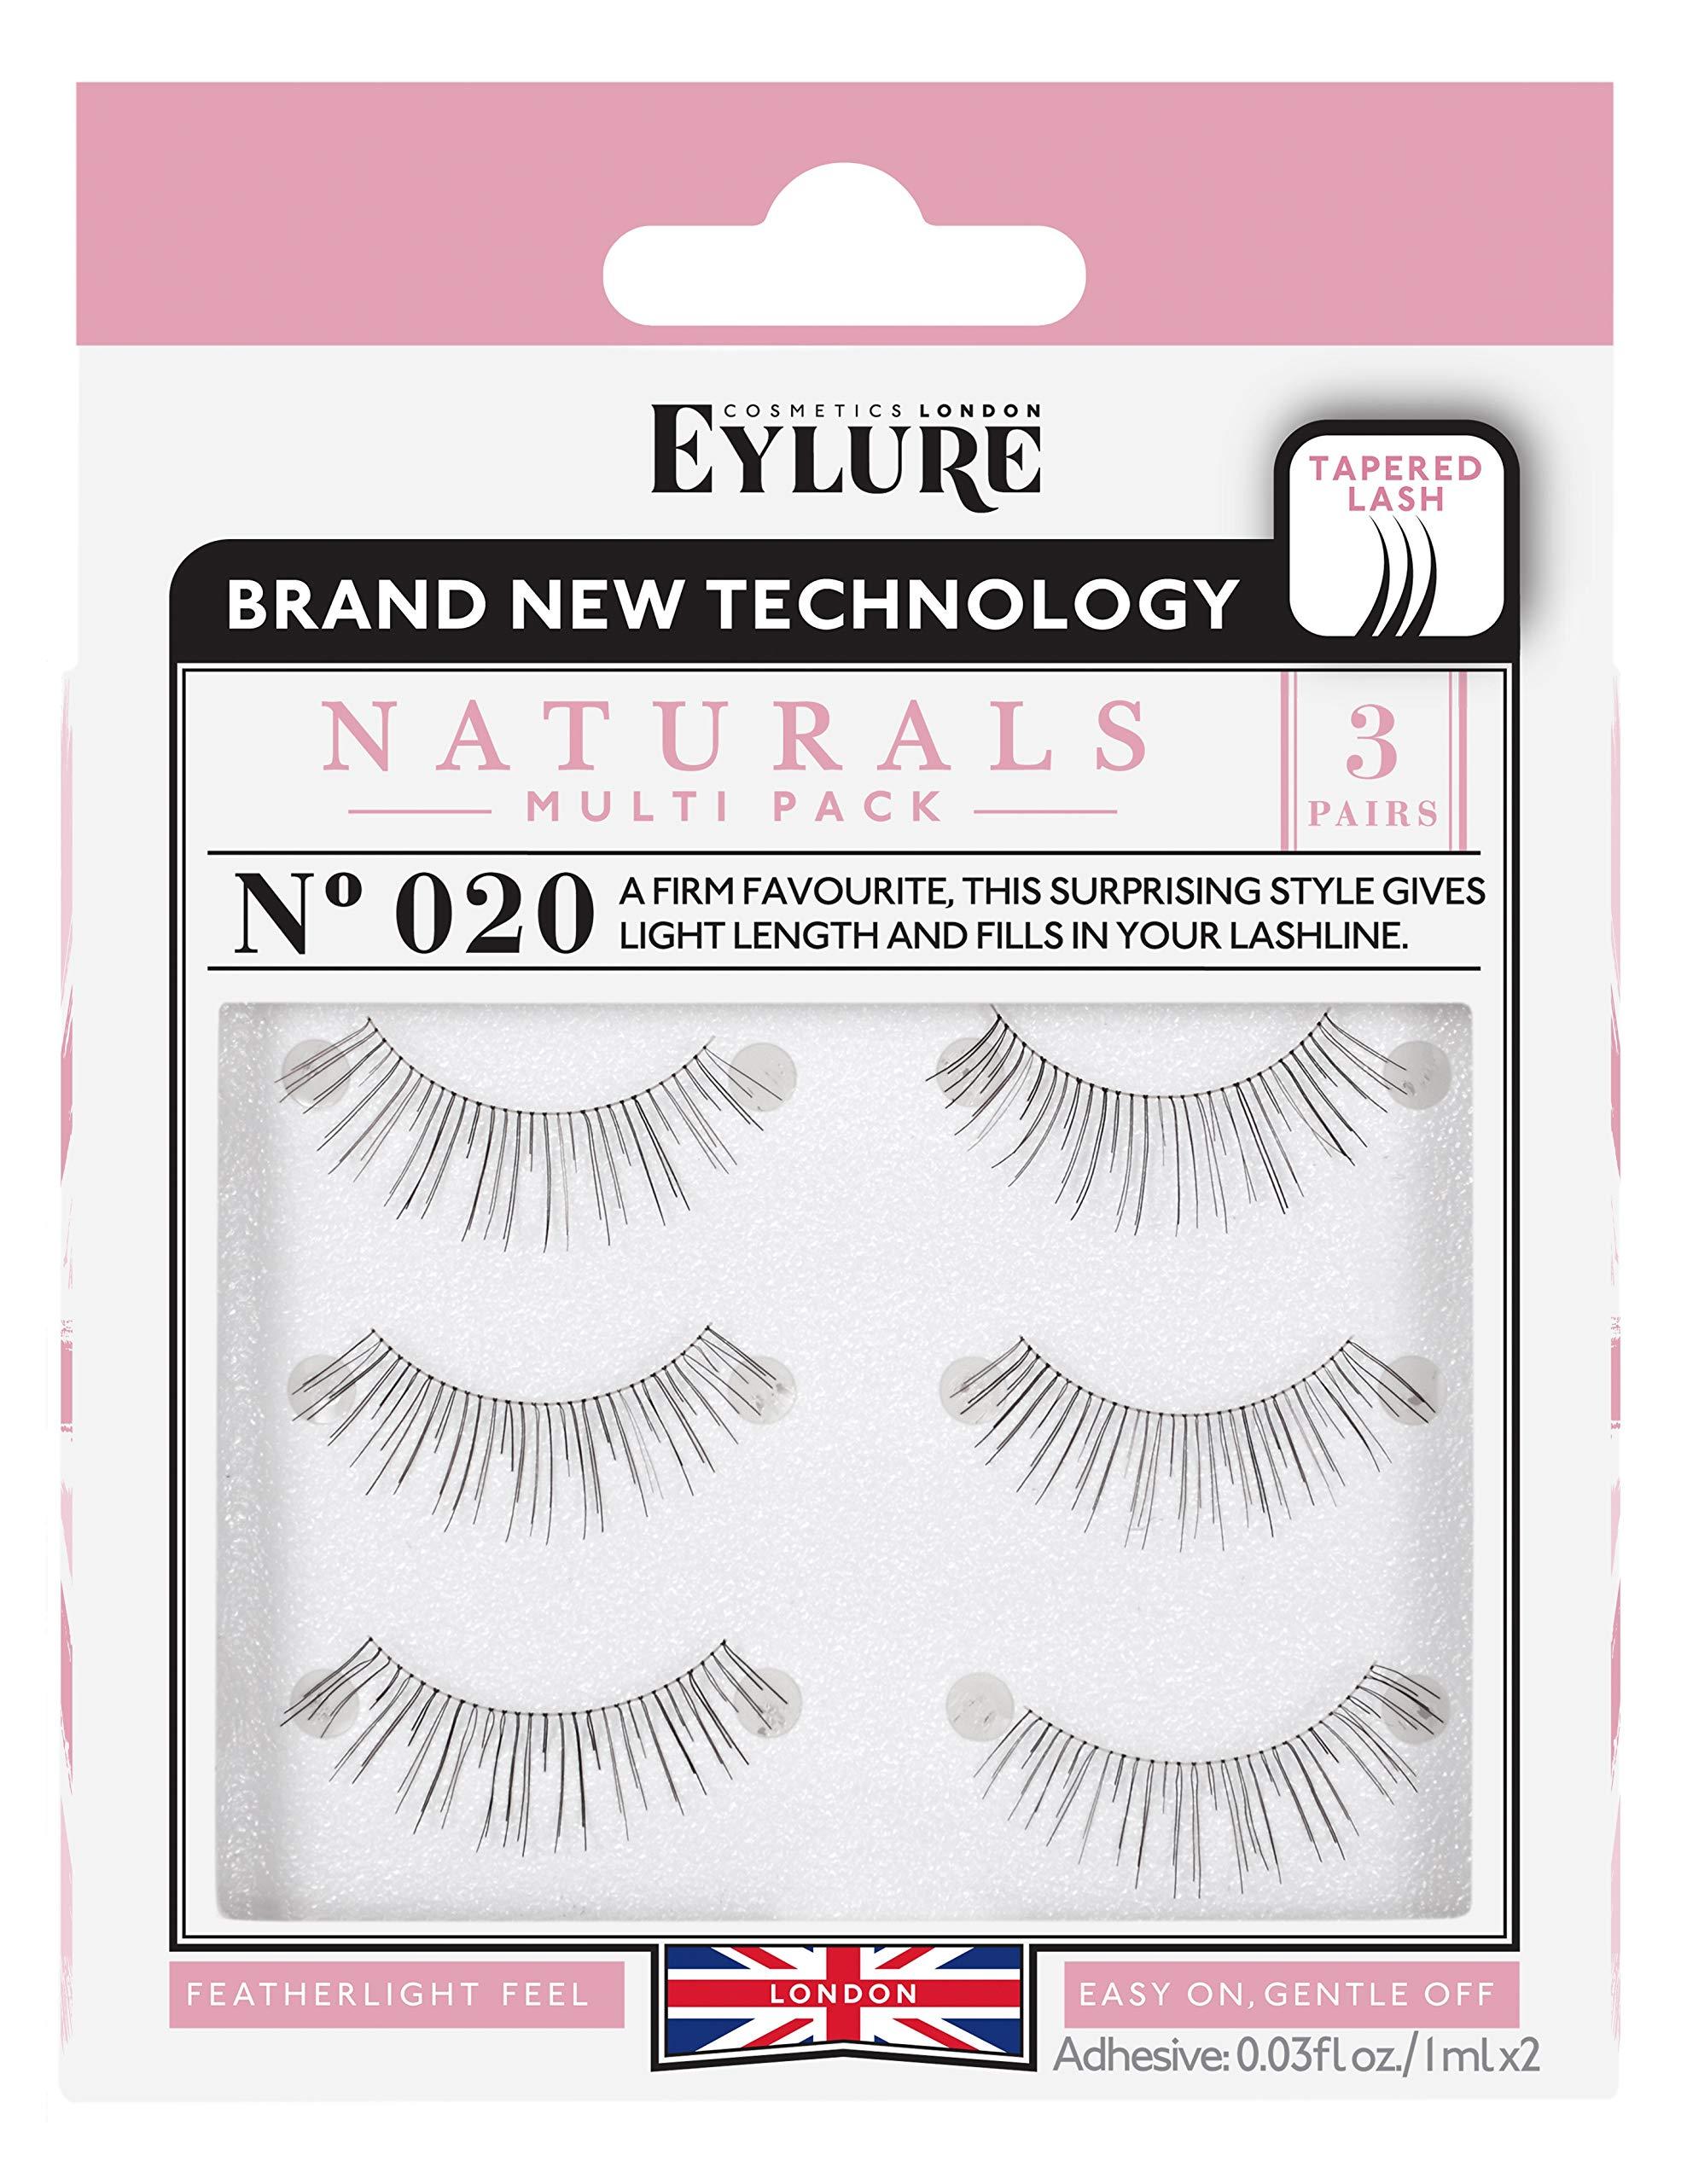 1e49588e218 Eylure Naturals False Eyelashes Multipack, Style No. 020, Reusable,  Adhesive Included,